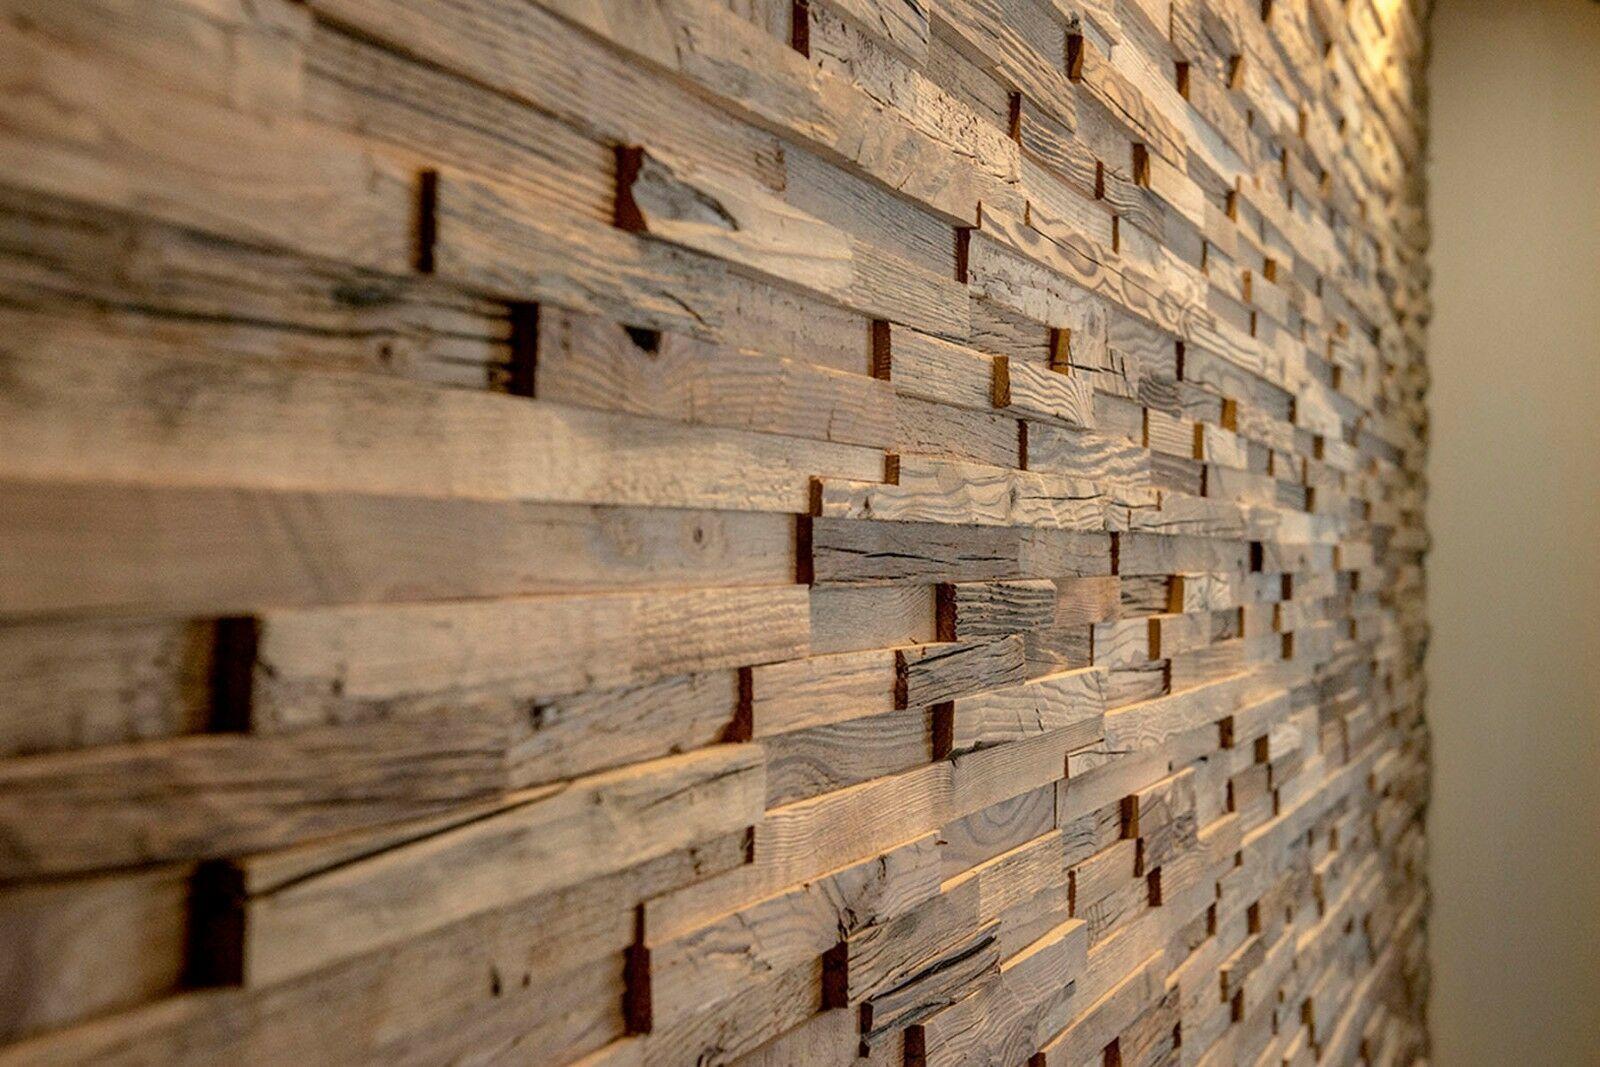 Www Ebay De Www Ebay De Akzentwand Holzwand Teppich Teppichboden Vinyl Wwwebayde Zement In 2020 Wandverkleidung Holz Holzpaneele Holzwand